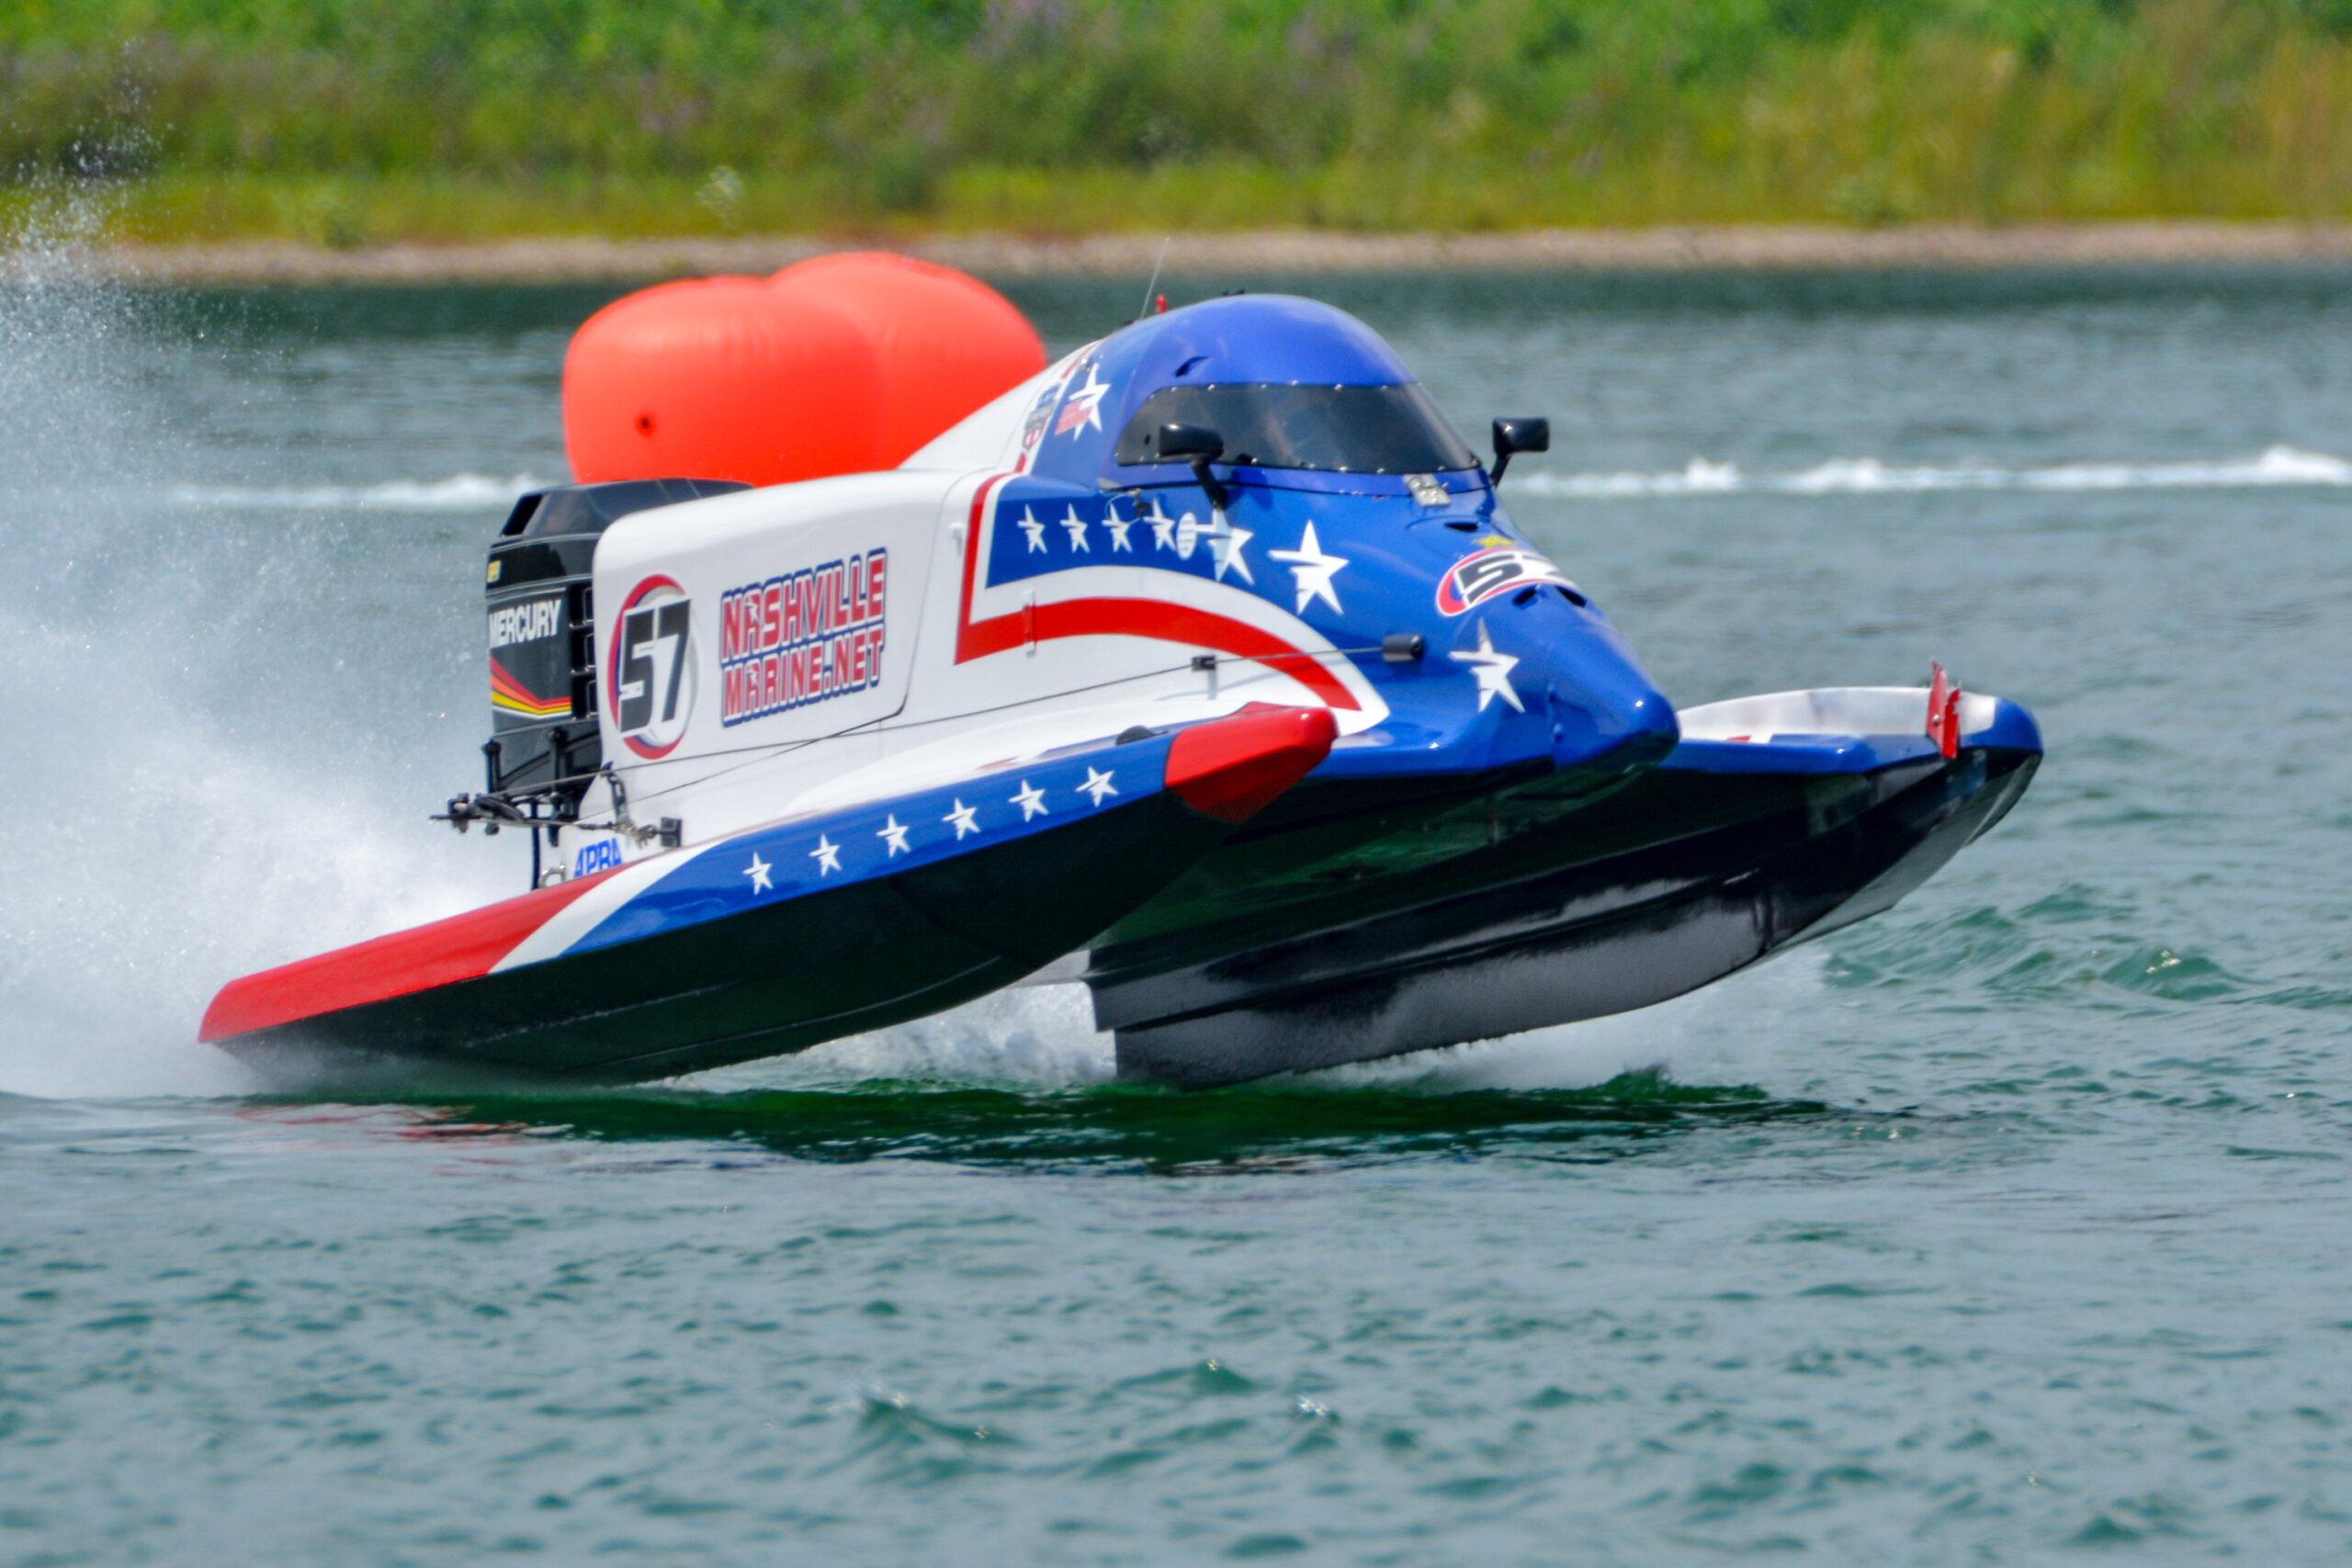 McMurray Racing Nashville Marine 2021 Springfield F1 Race-11